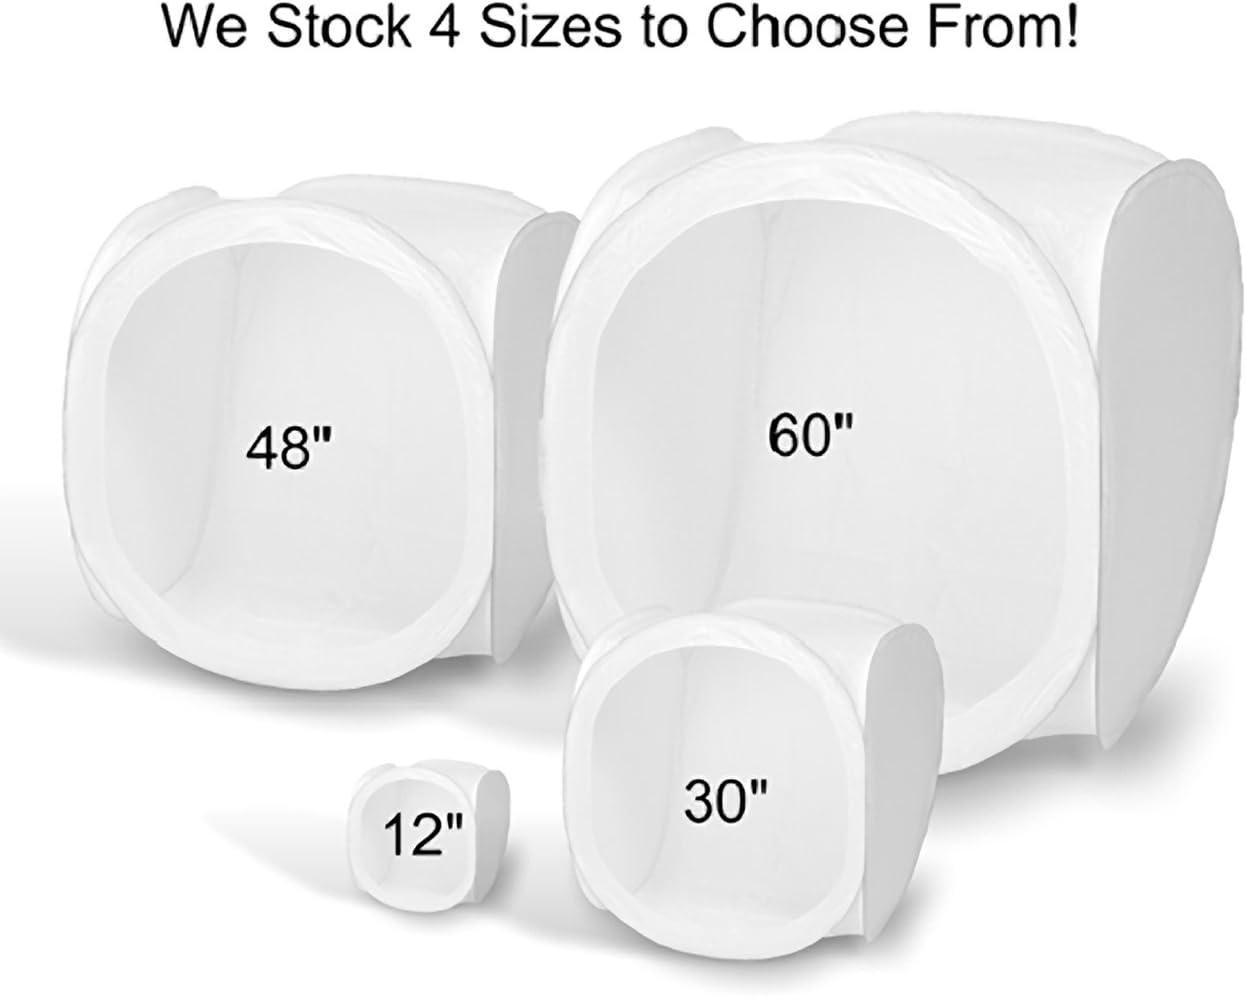 Square Perfect 30 Inch Photography Light Tent-Photo Cube Softbox Light Box 76cm